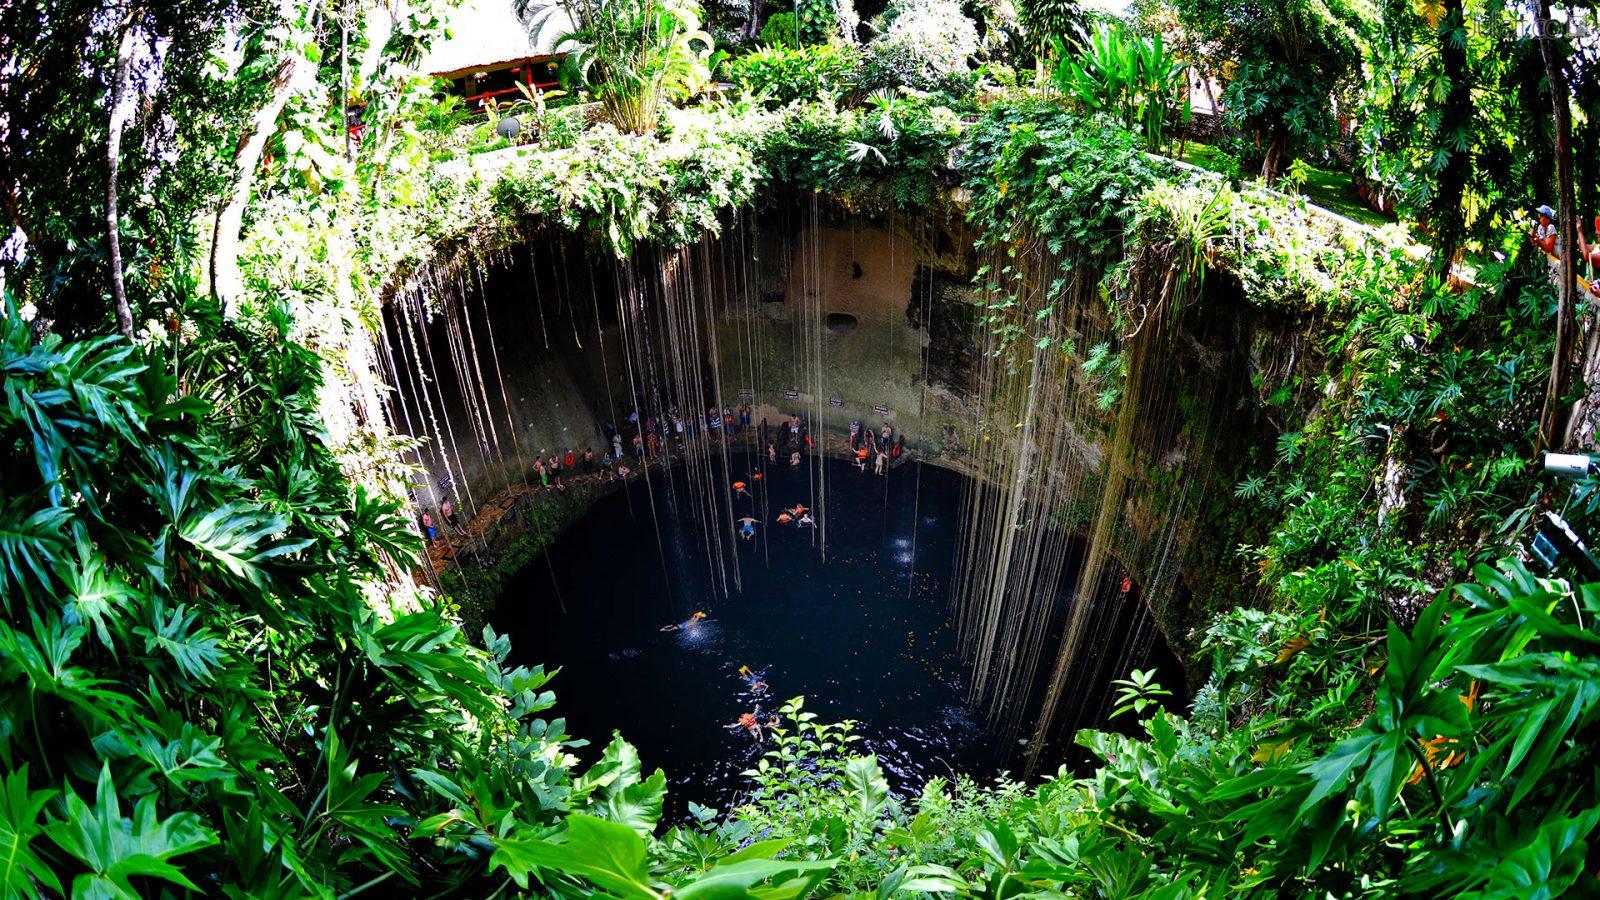 На фото изображён Юкатан